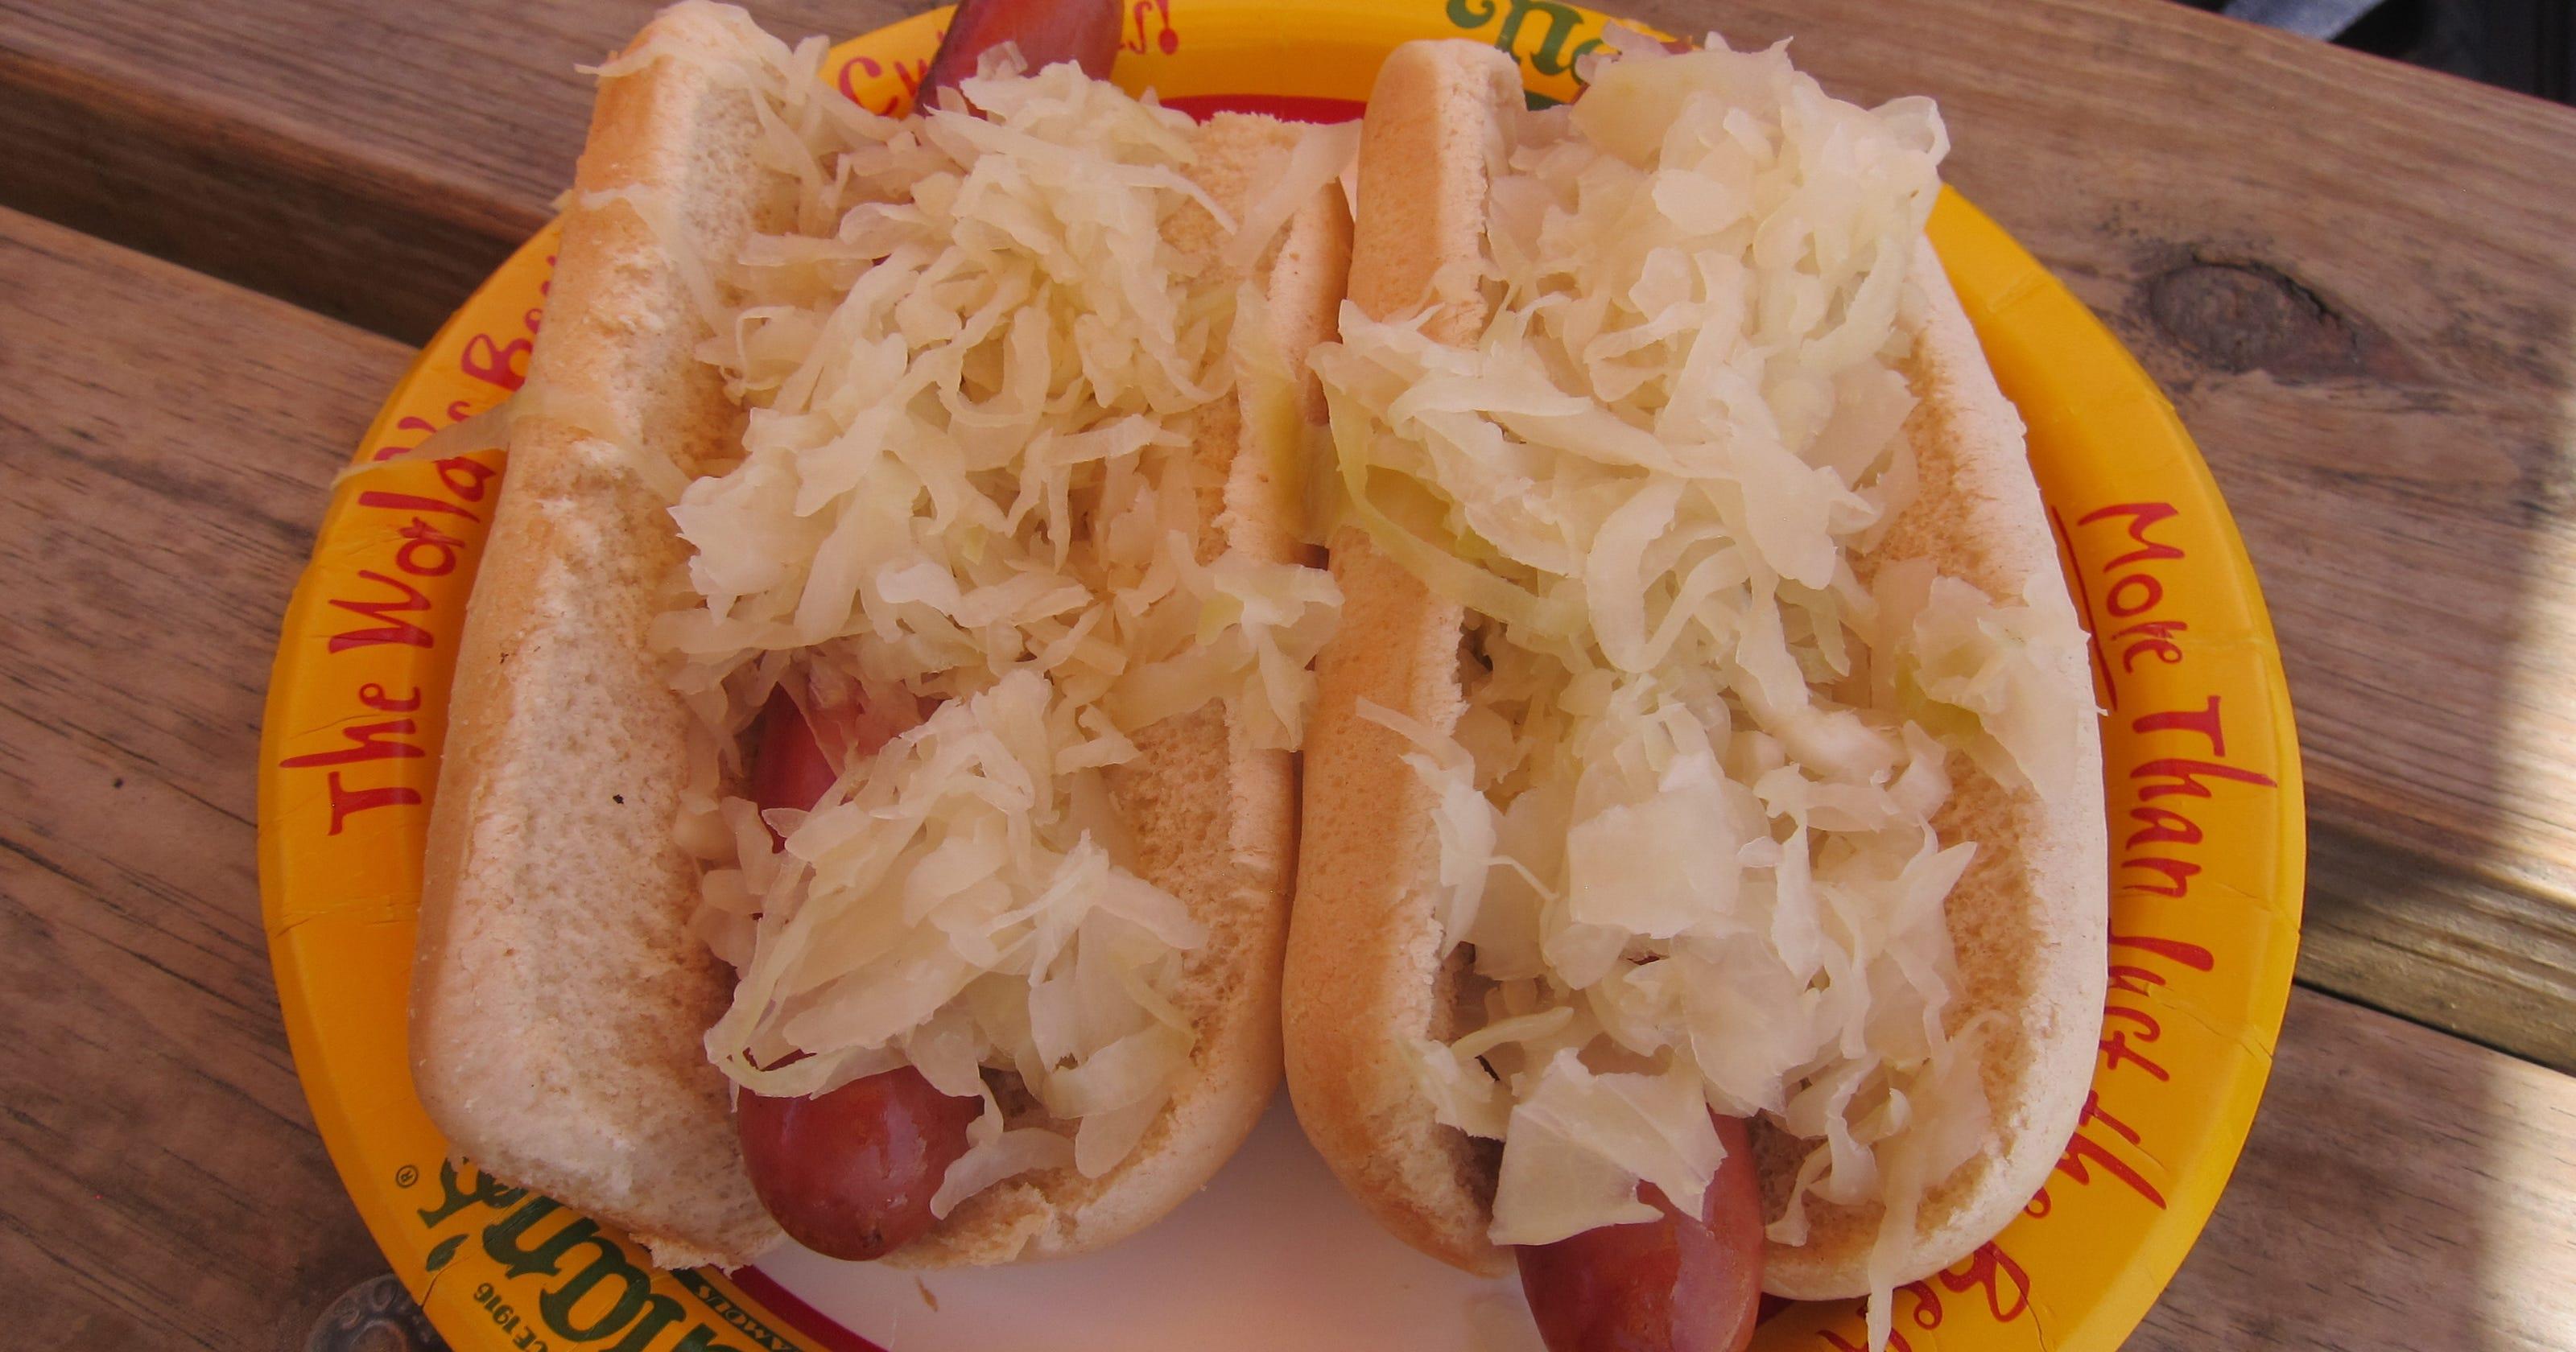 Hot Dogs Des Moines